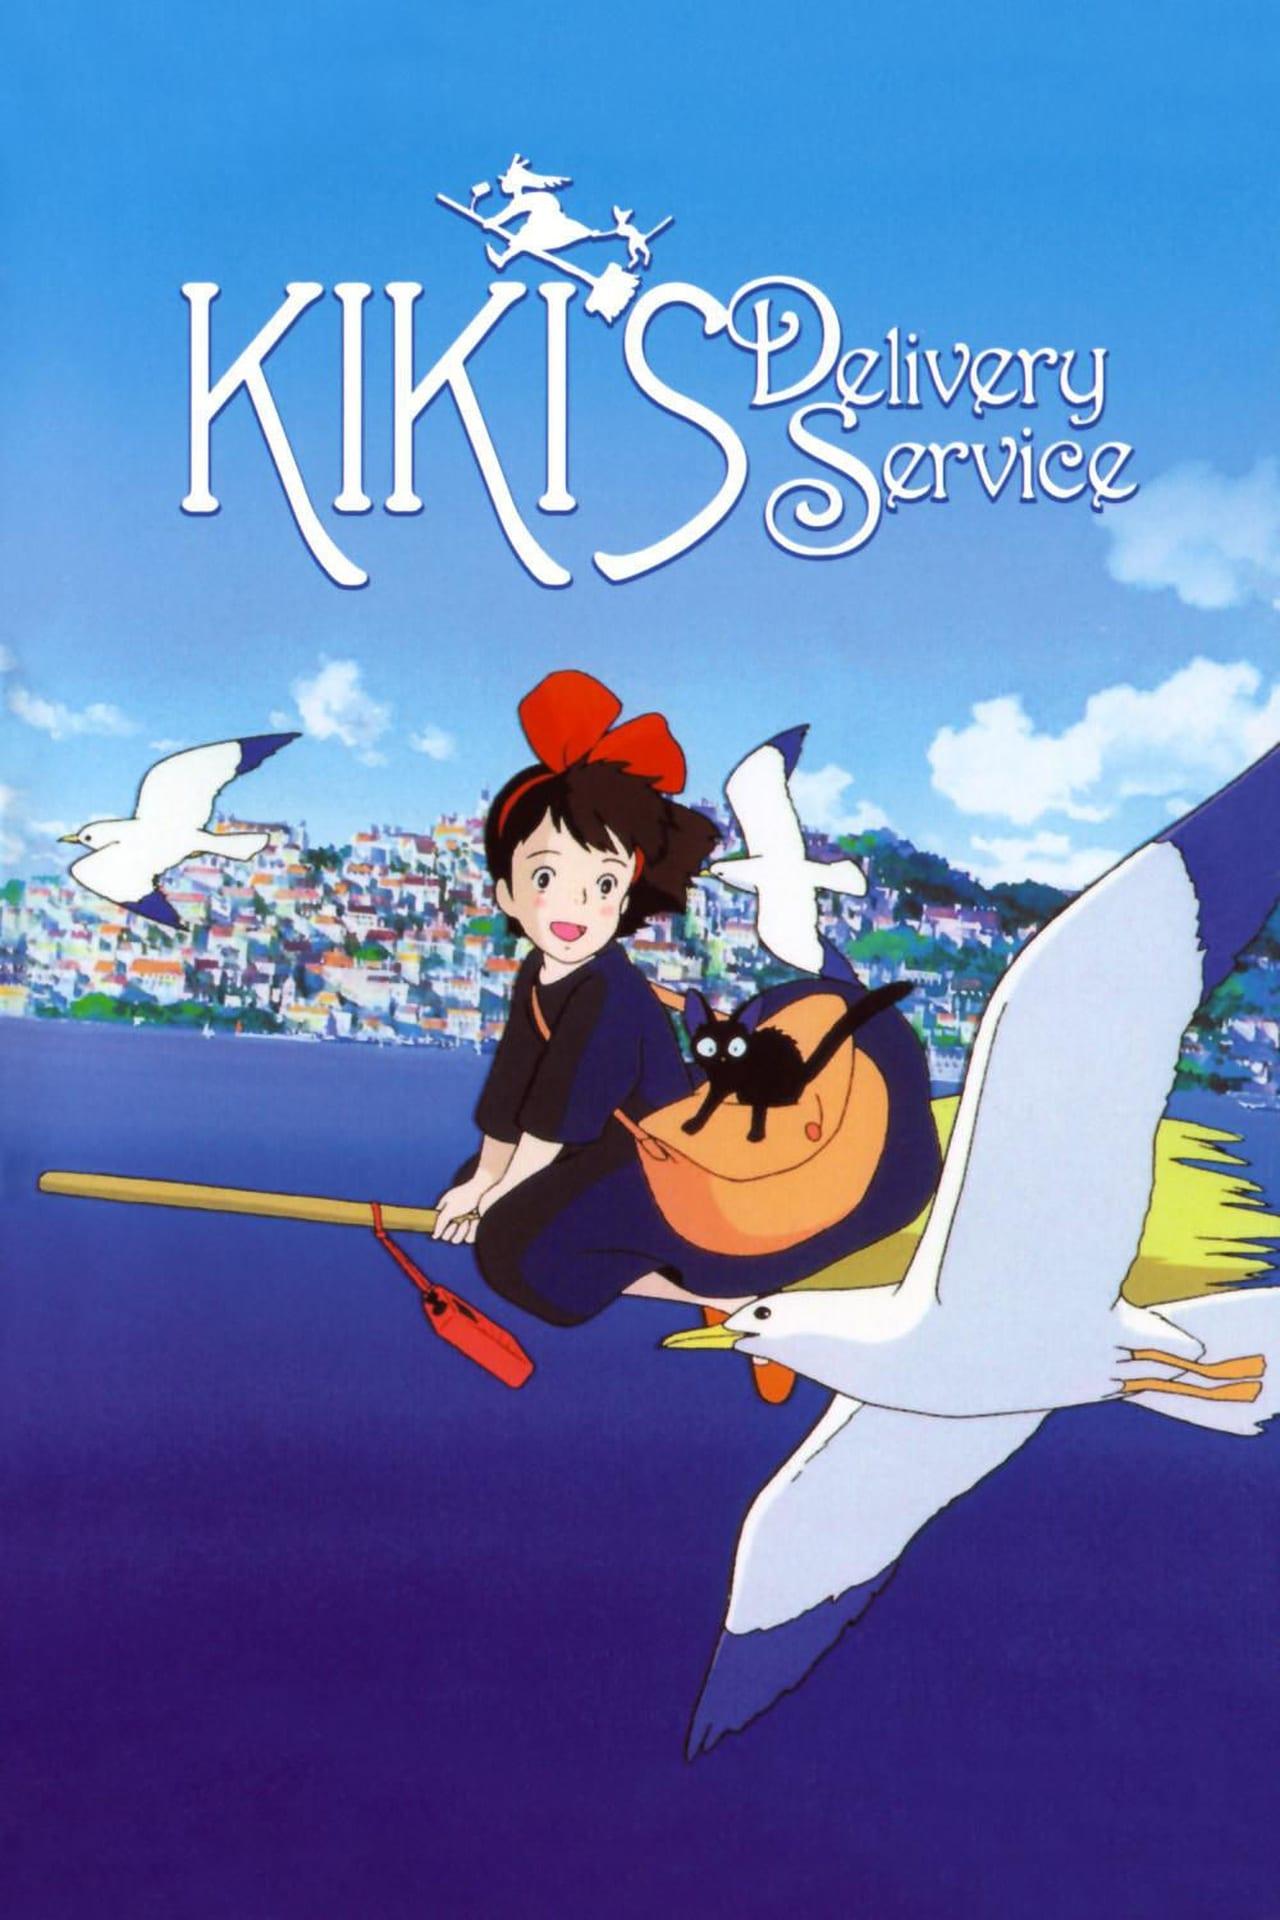 Kiki S Delivery Service Subtitles English Opensubtitles Com